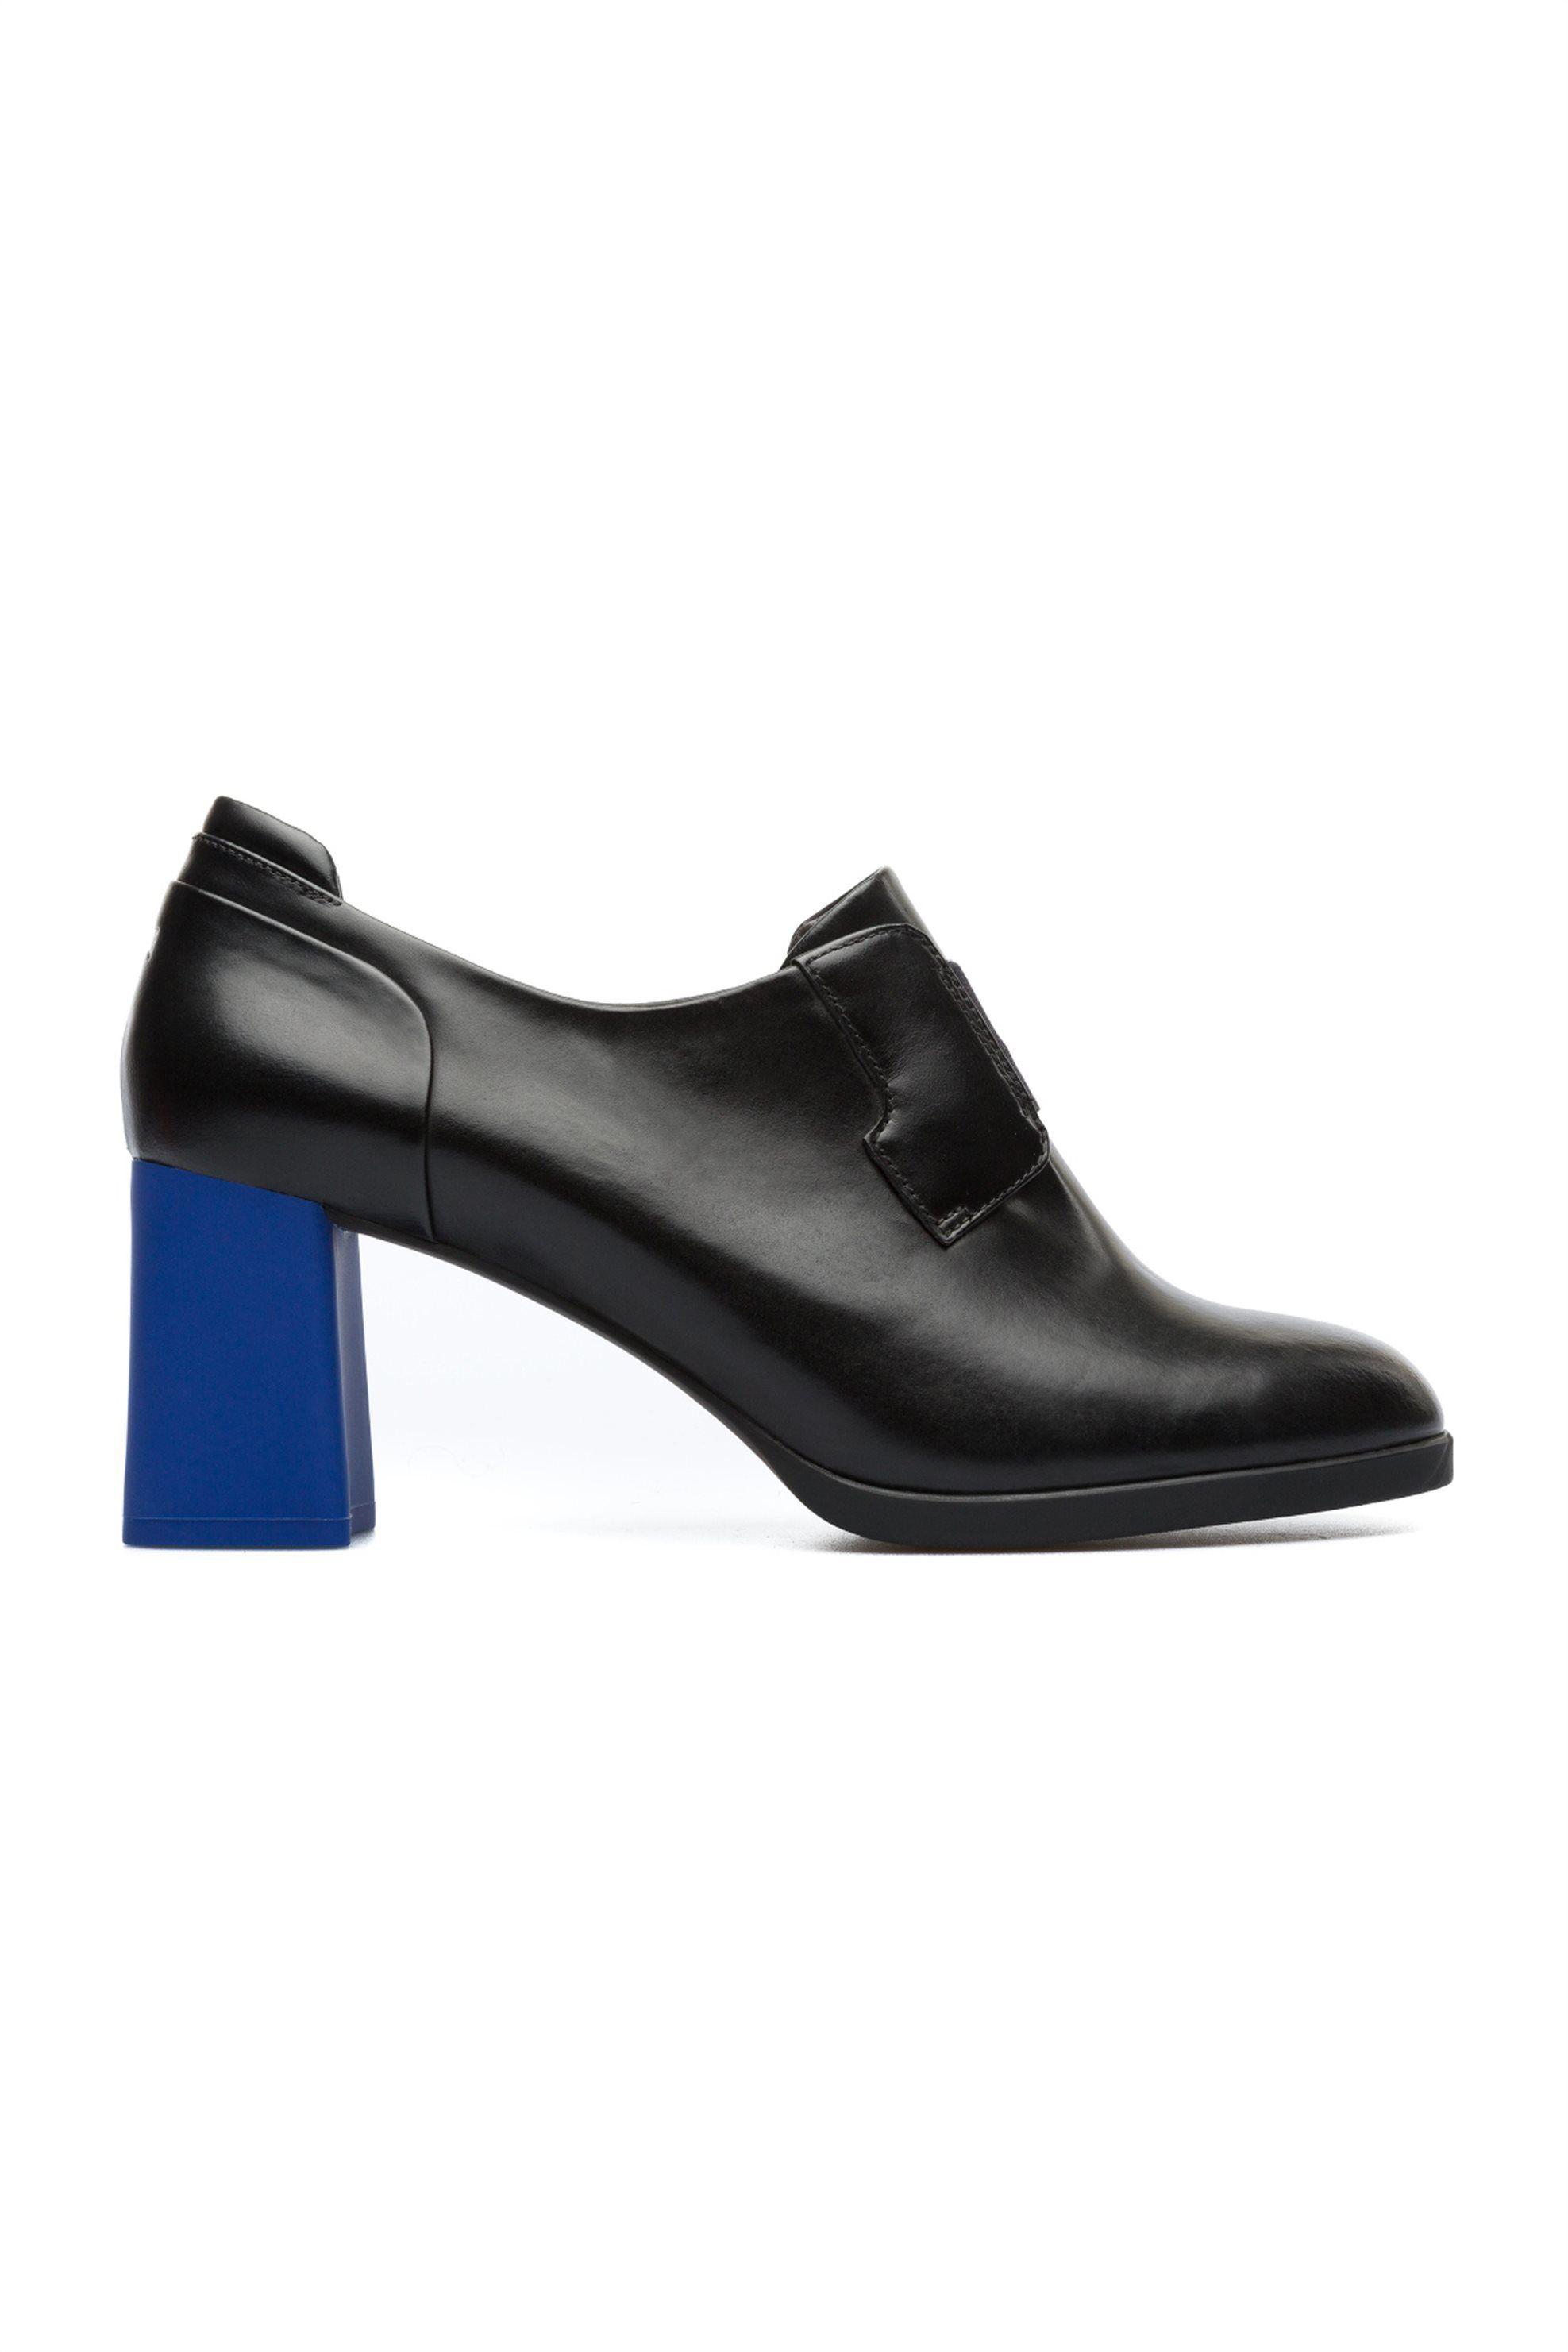 16fdb556741 Μποτάκια Camper. Γυναικεία μαύρα παπούτσια με χοντρό τακούνι σε διαφορετικό  χρώμα. Τακούνι 7 εκ